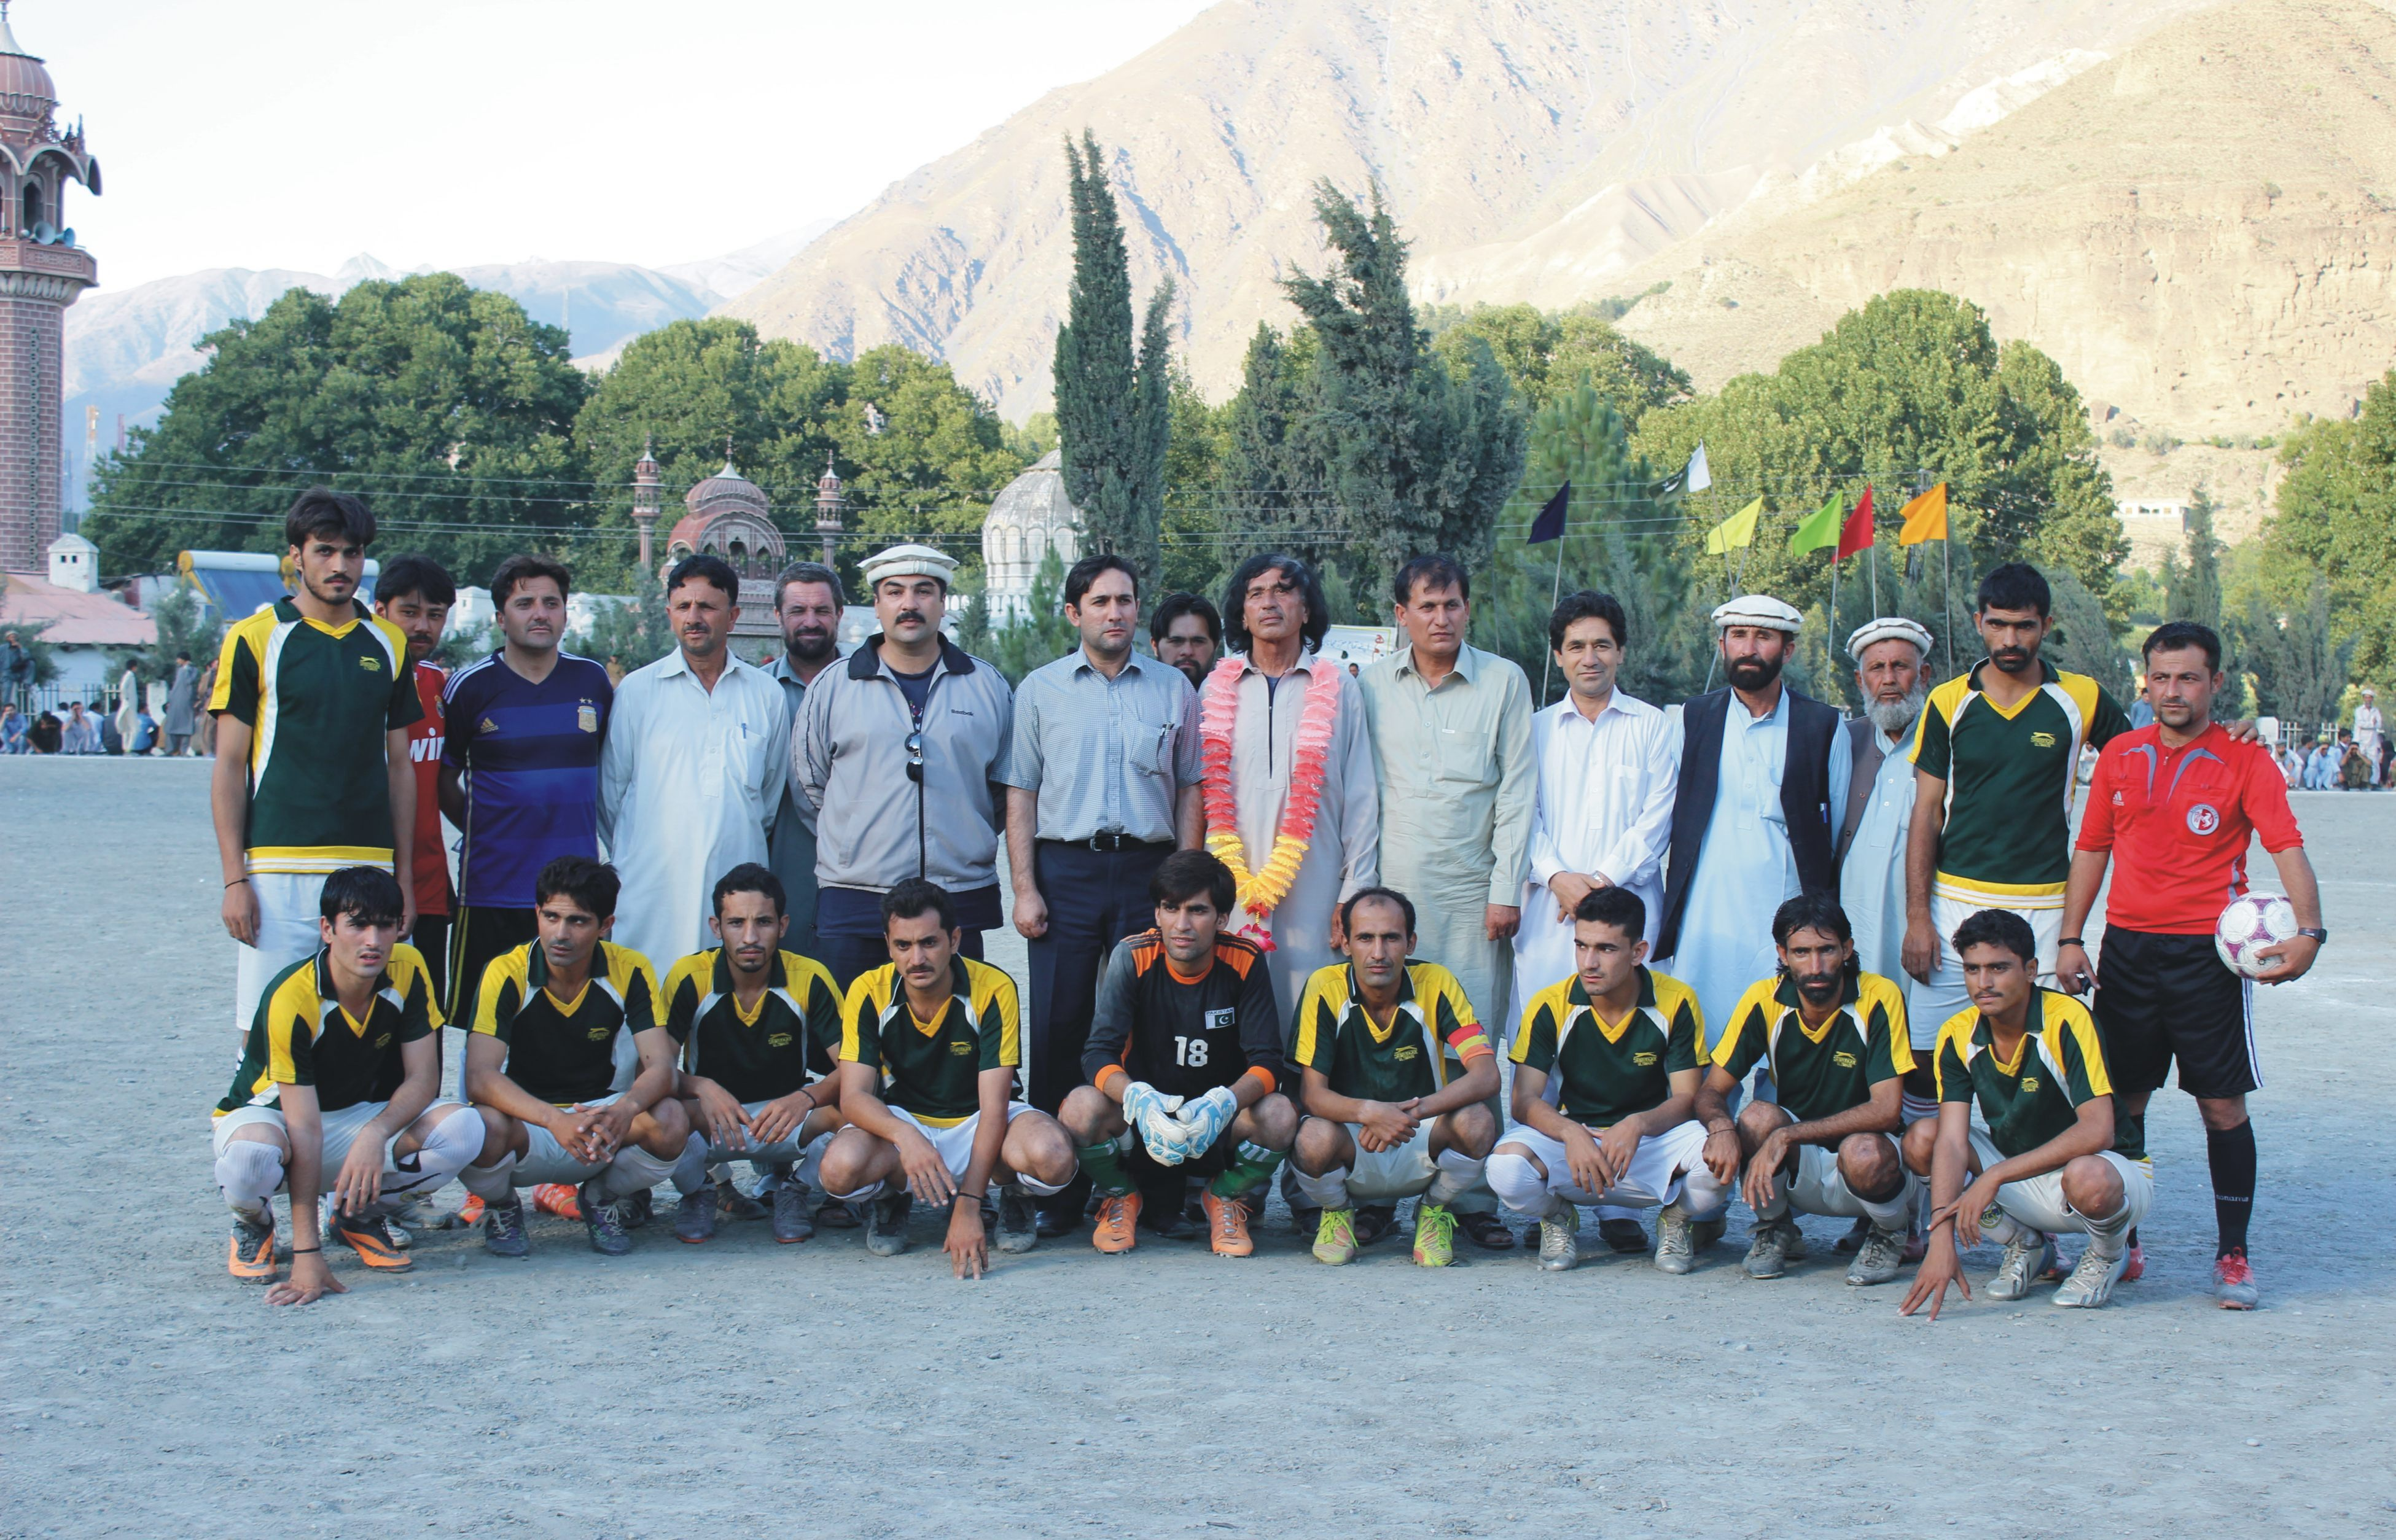 Chatral-sports-pic-by-Ayaz-raza-1-1